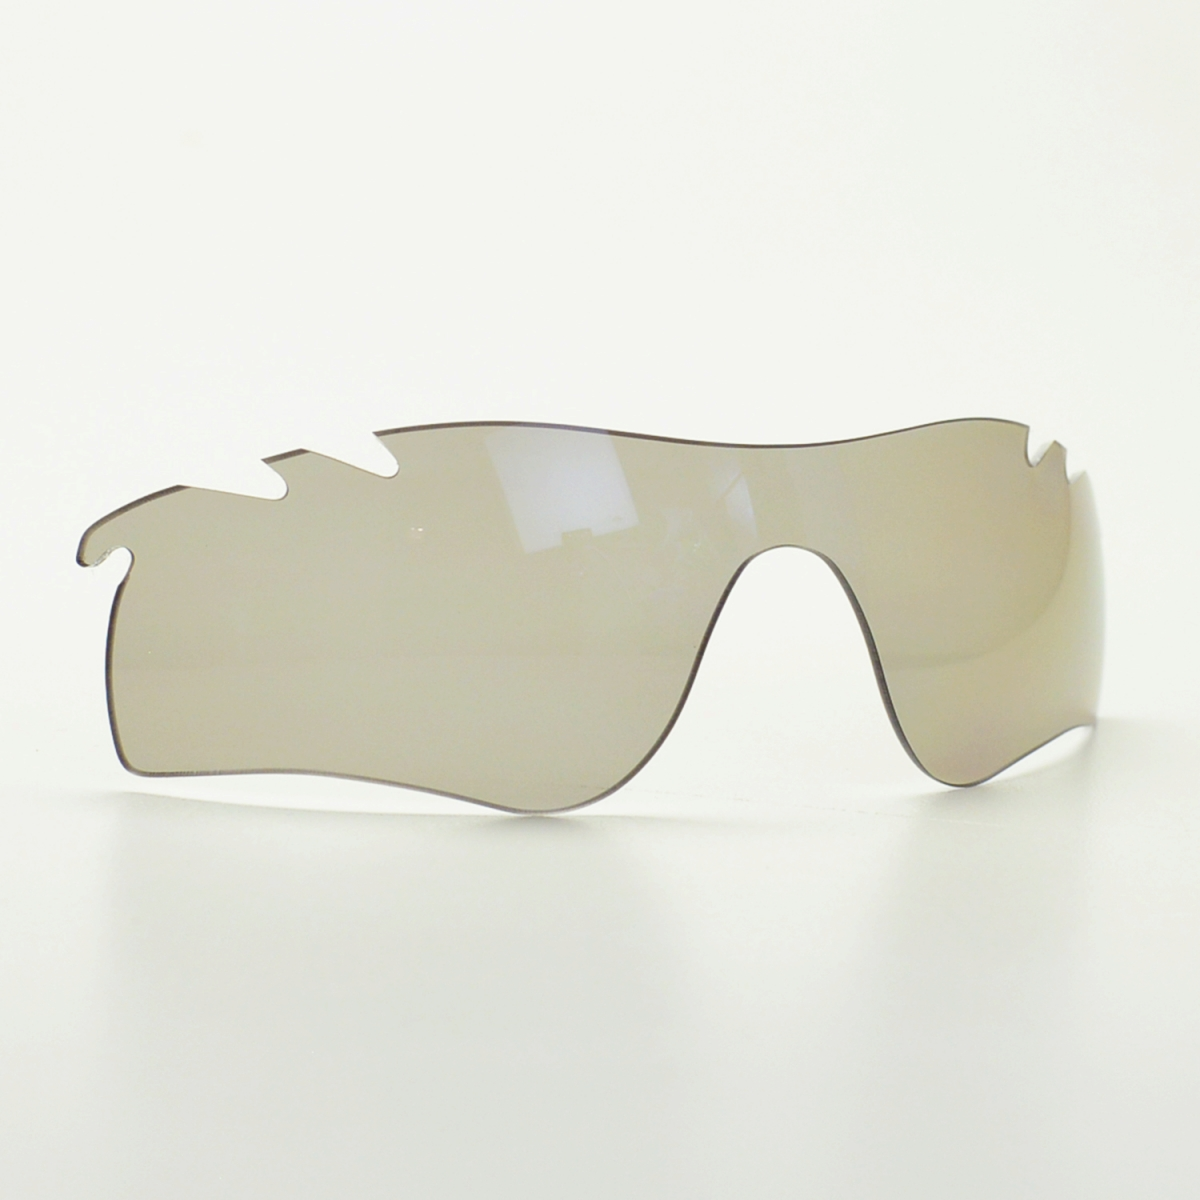 GOODMAN LENS MANUFACTURE グッドマンレンズマニュファクチュア RADARLOCK用交換レンズ 偏光ライトグレーGOODMAN LENS MANUFACTURE グッドマンレンズマニュファクチュア レンズ 調光 偏光 OAKLEY オークリー 交換レンズ